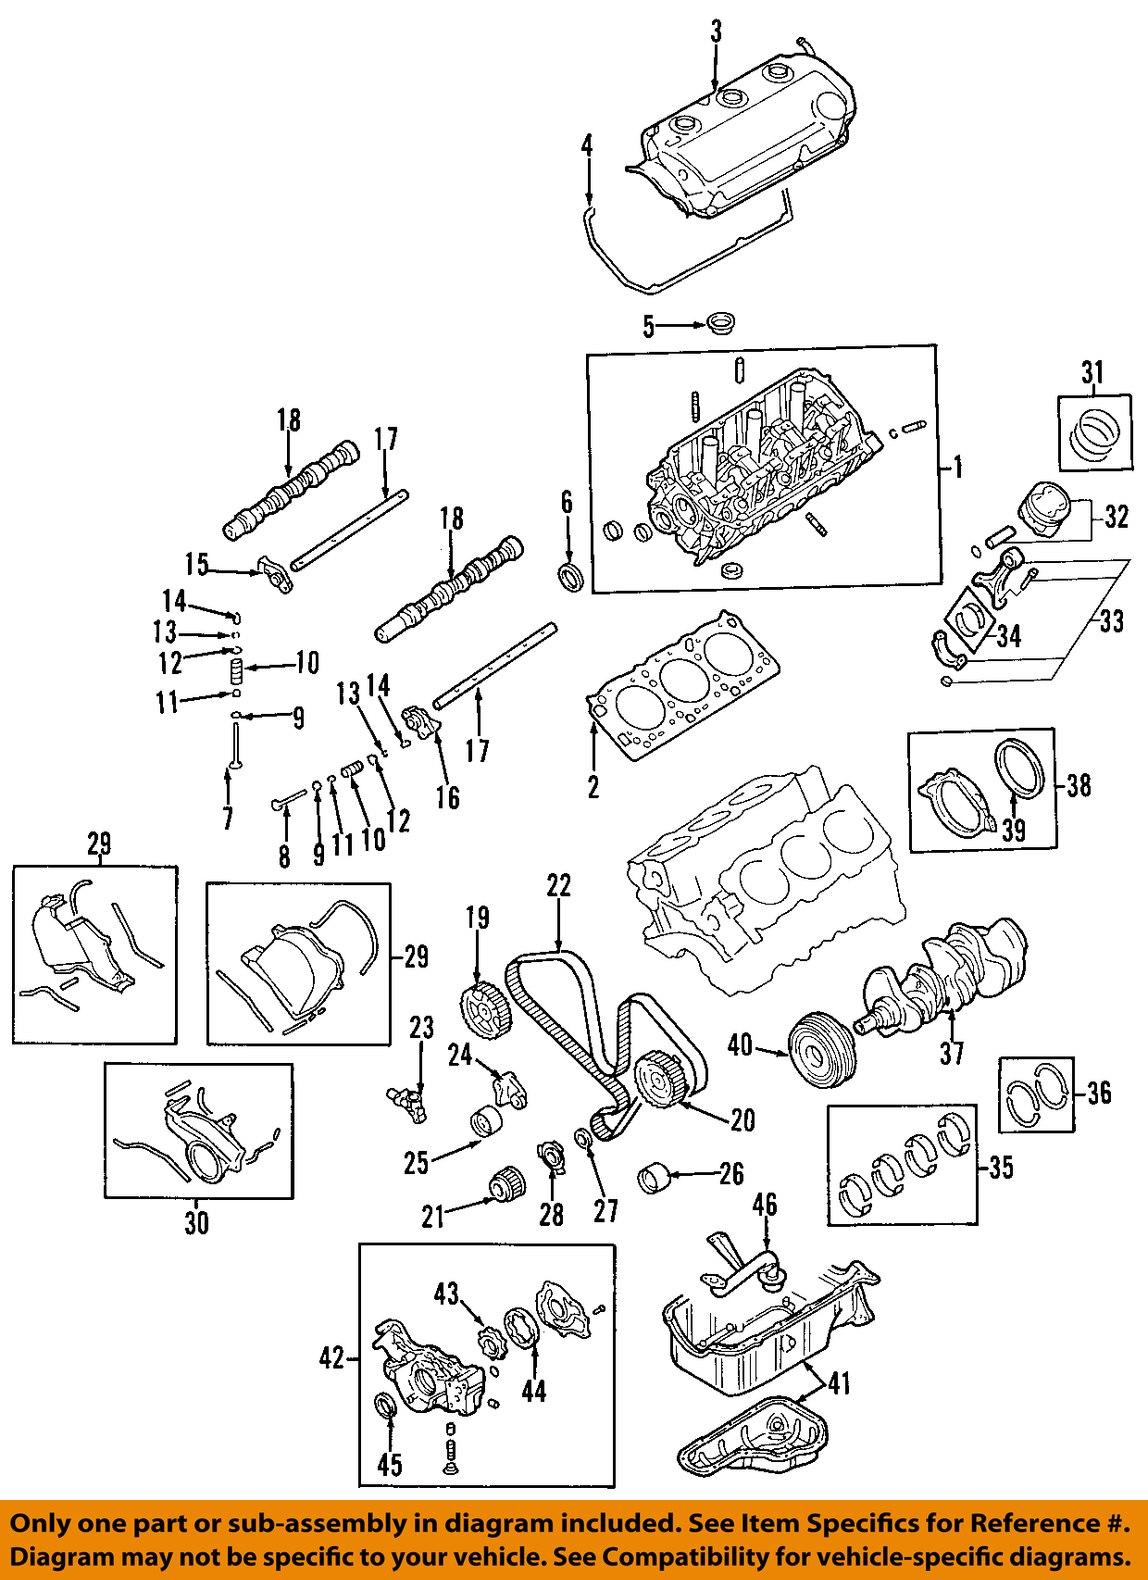 hight resolution of wiring drawling for 2003 3 0 mitsubishi engine online wiring diagrammitsubishi 6g72 wiring diagram 2 11